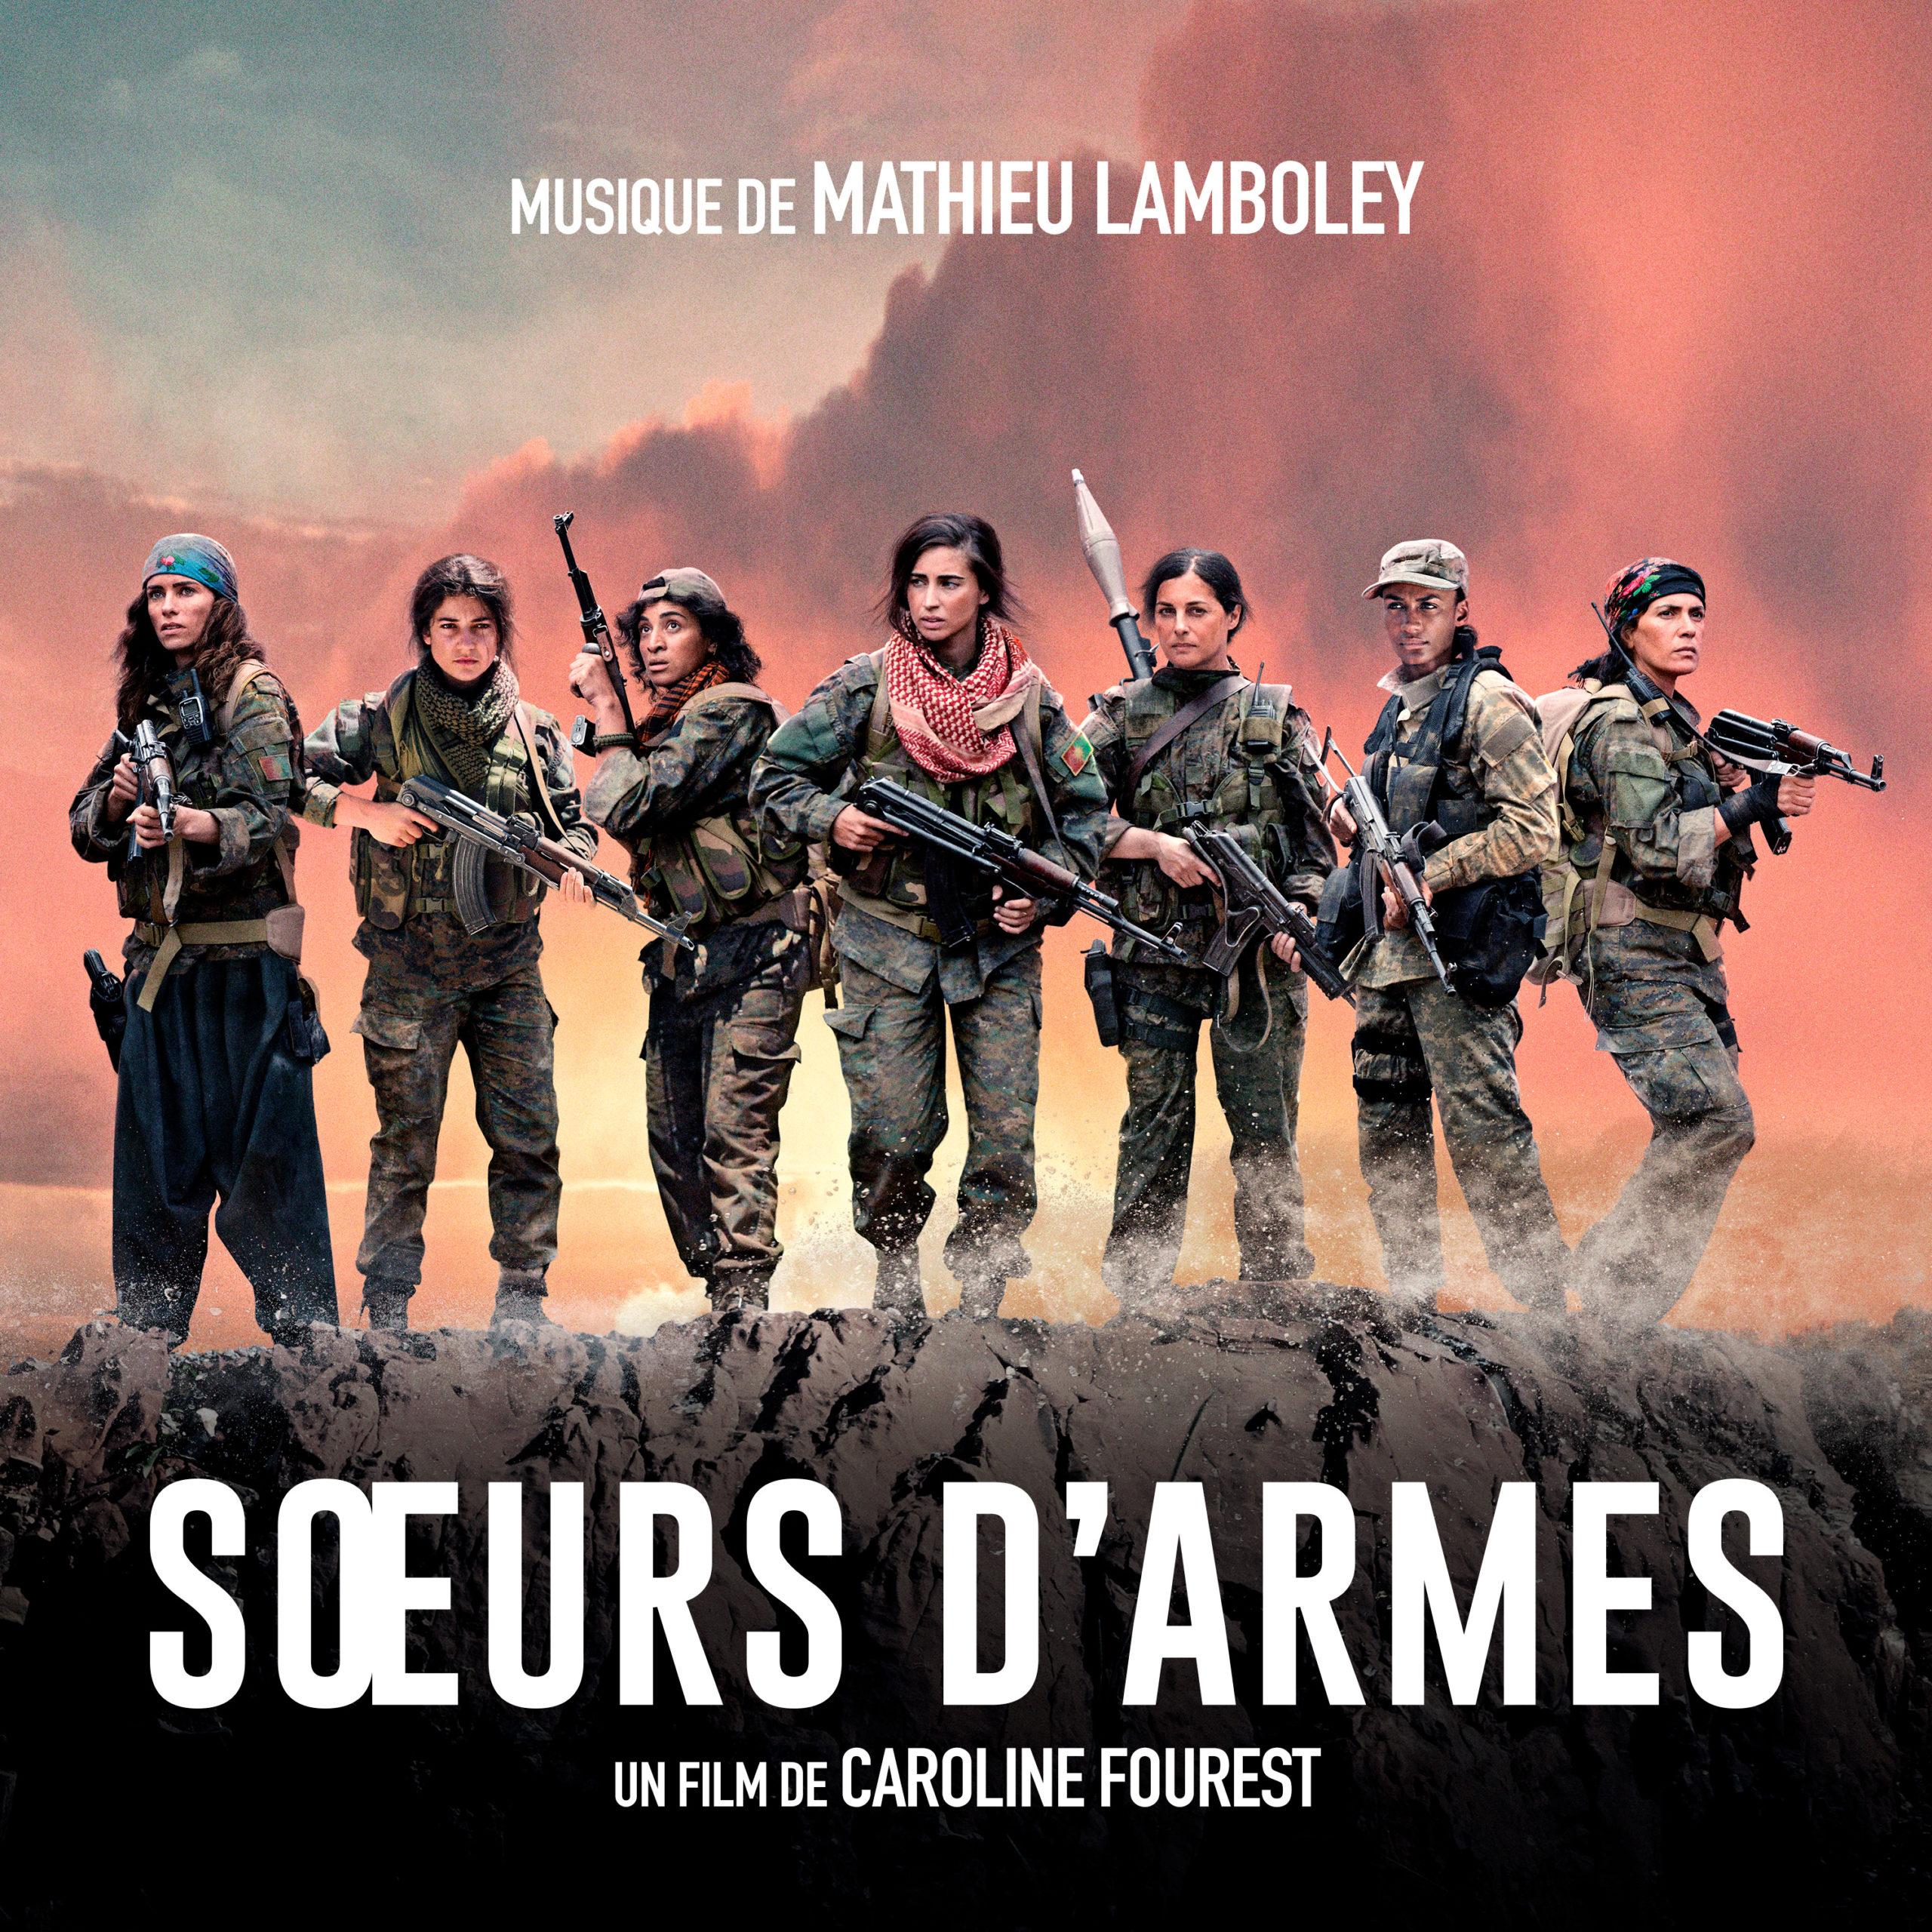 Soeurs d'armes de Caroline Fourest – Mathieu Lamboley